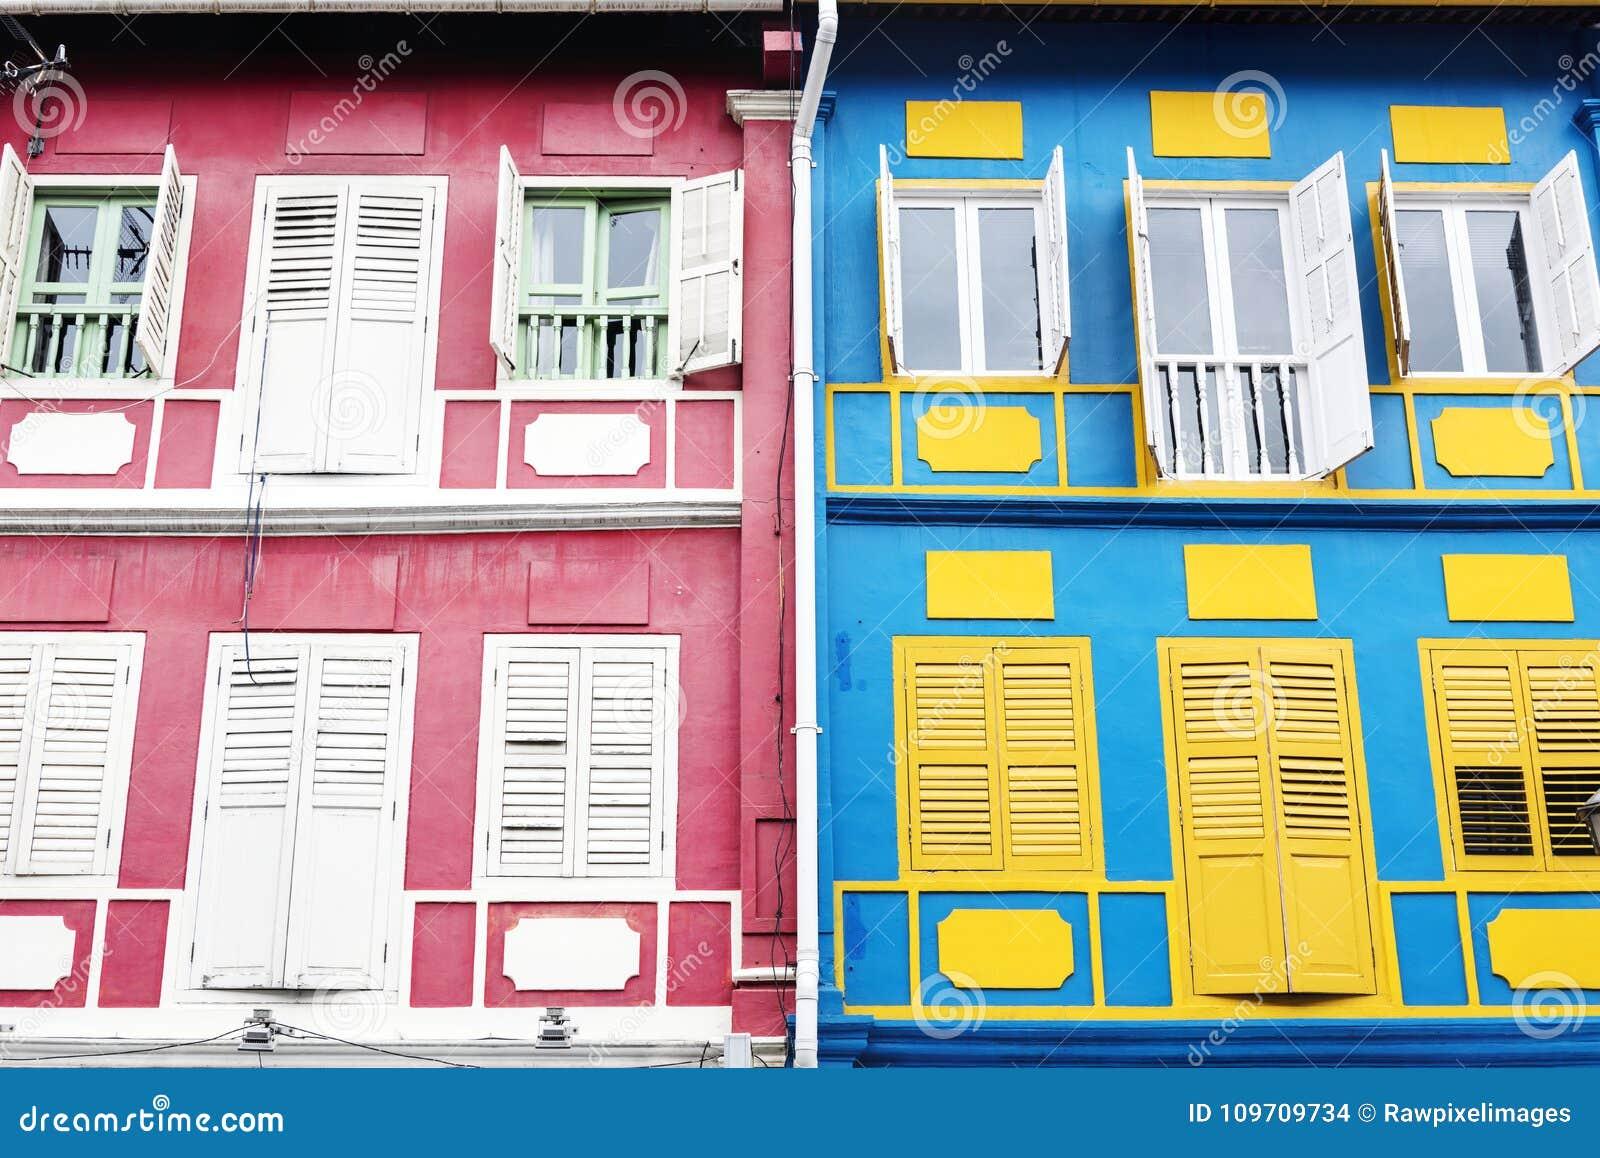 Estrutura artística dos prédios de apartamentos coloridos